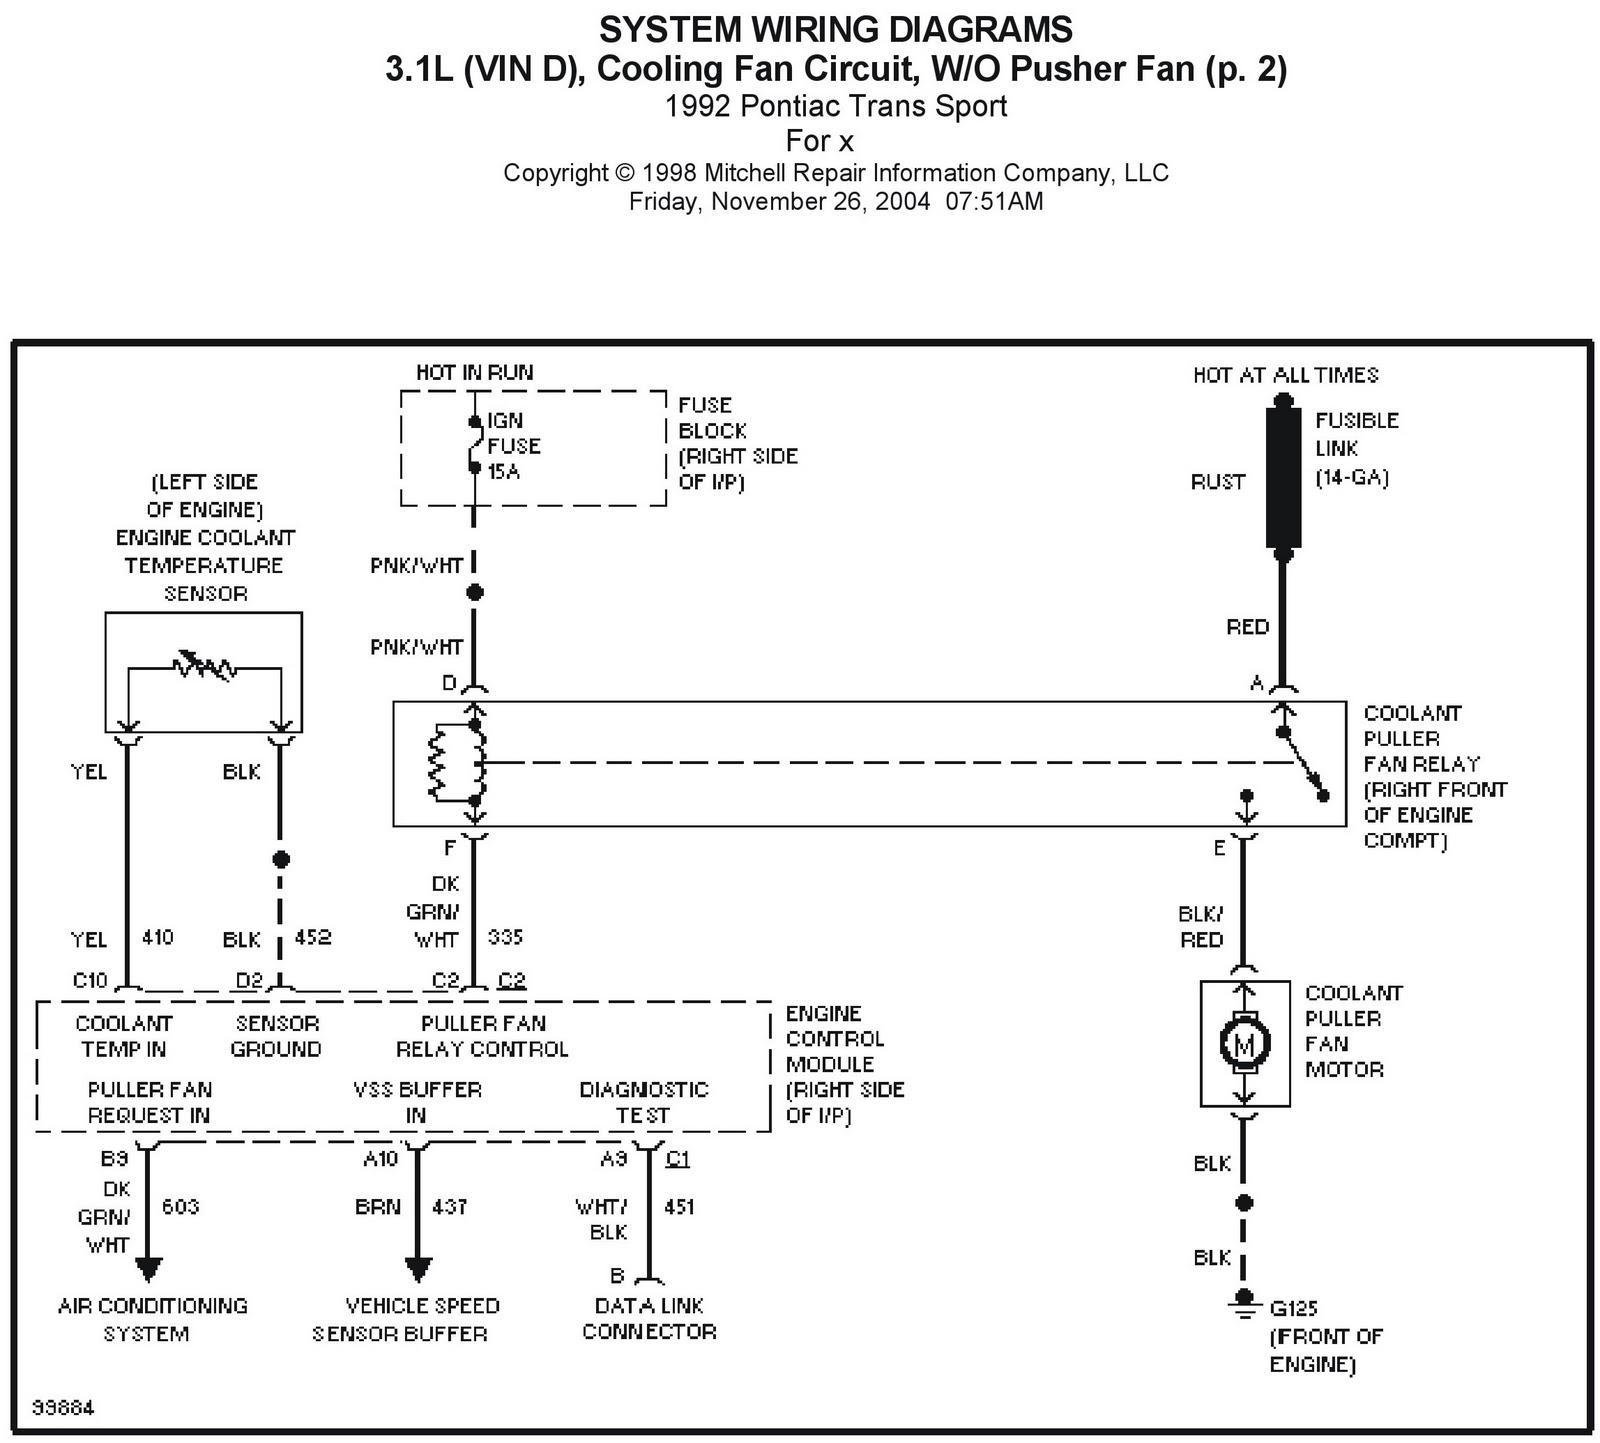 1997 Chevy Camaro Vin K Alternator Wiring Diagram